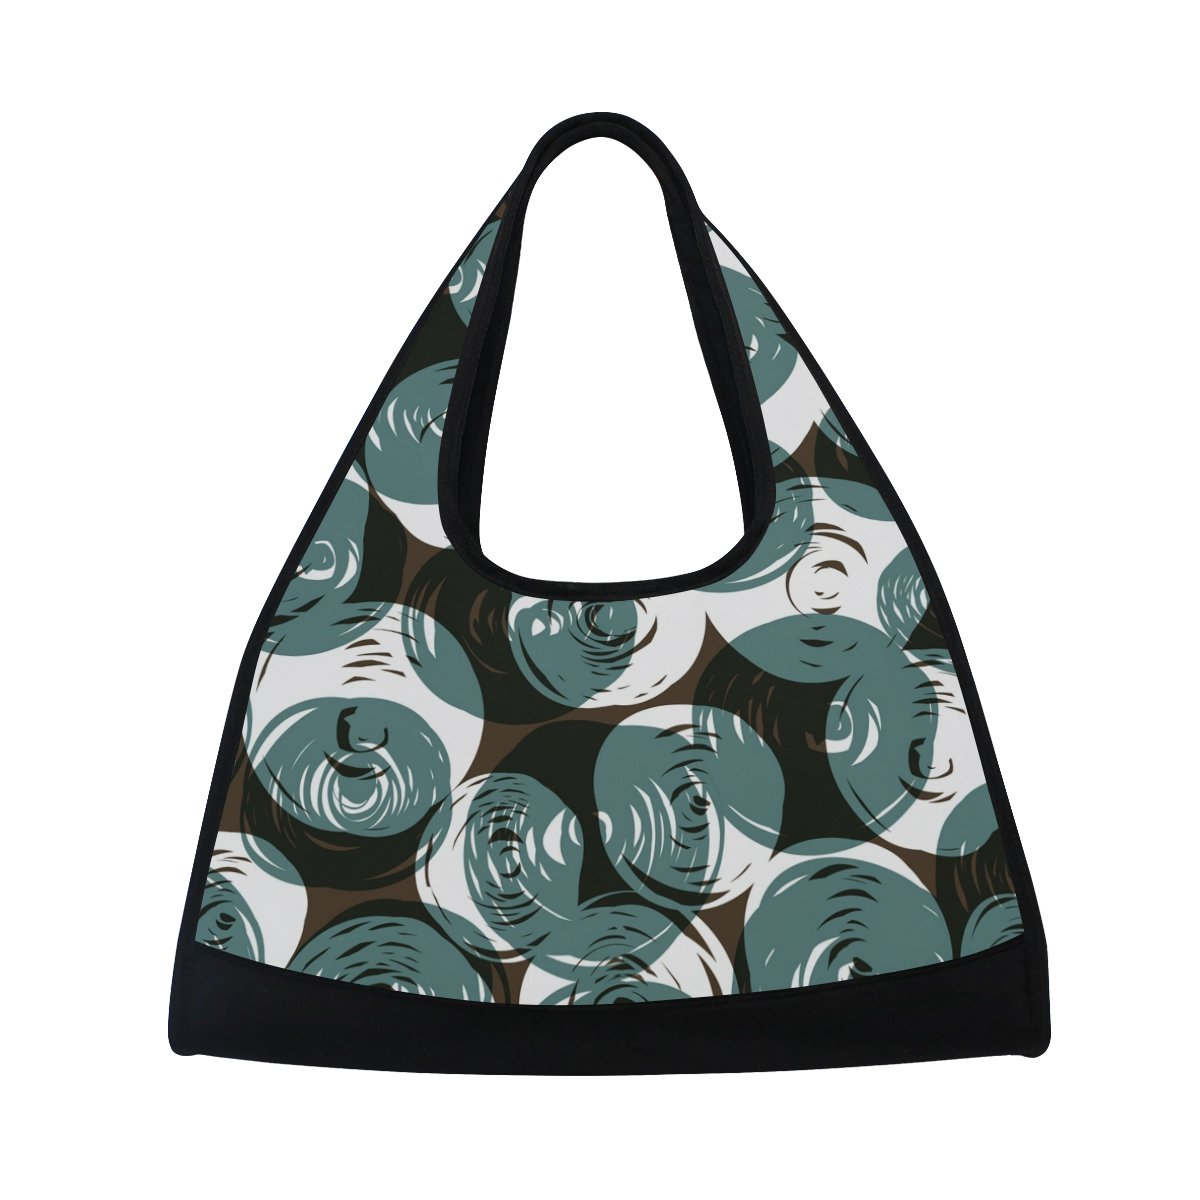 Gym Bag Sports Holdall Geometric Figure Round Canvas Shoulder Bag Overnight Travel Bag for Men and Women